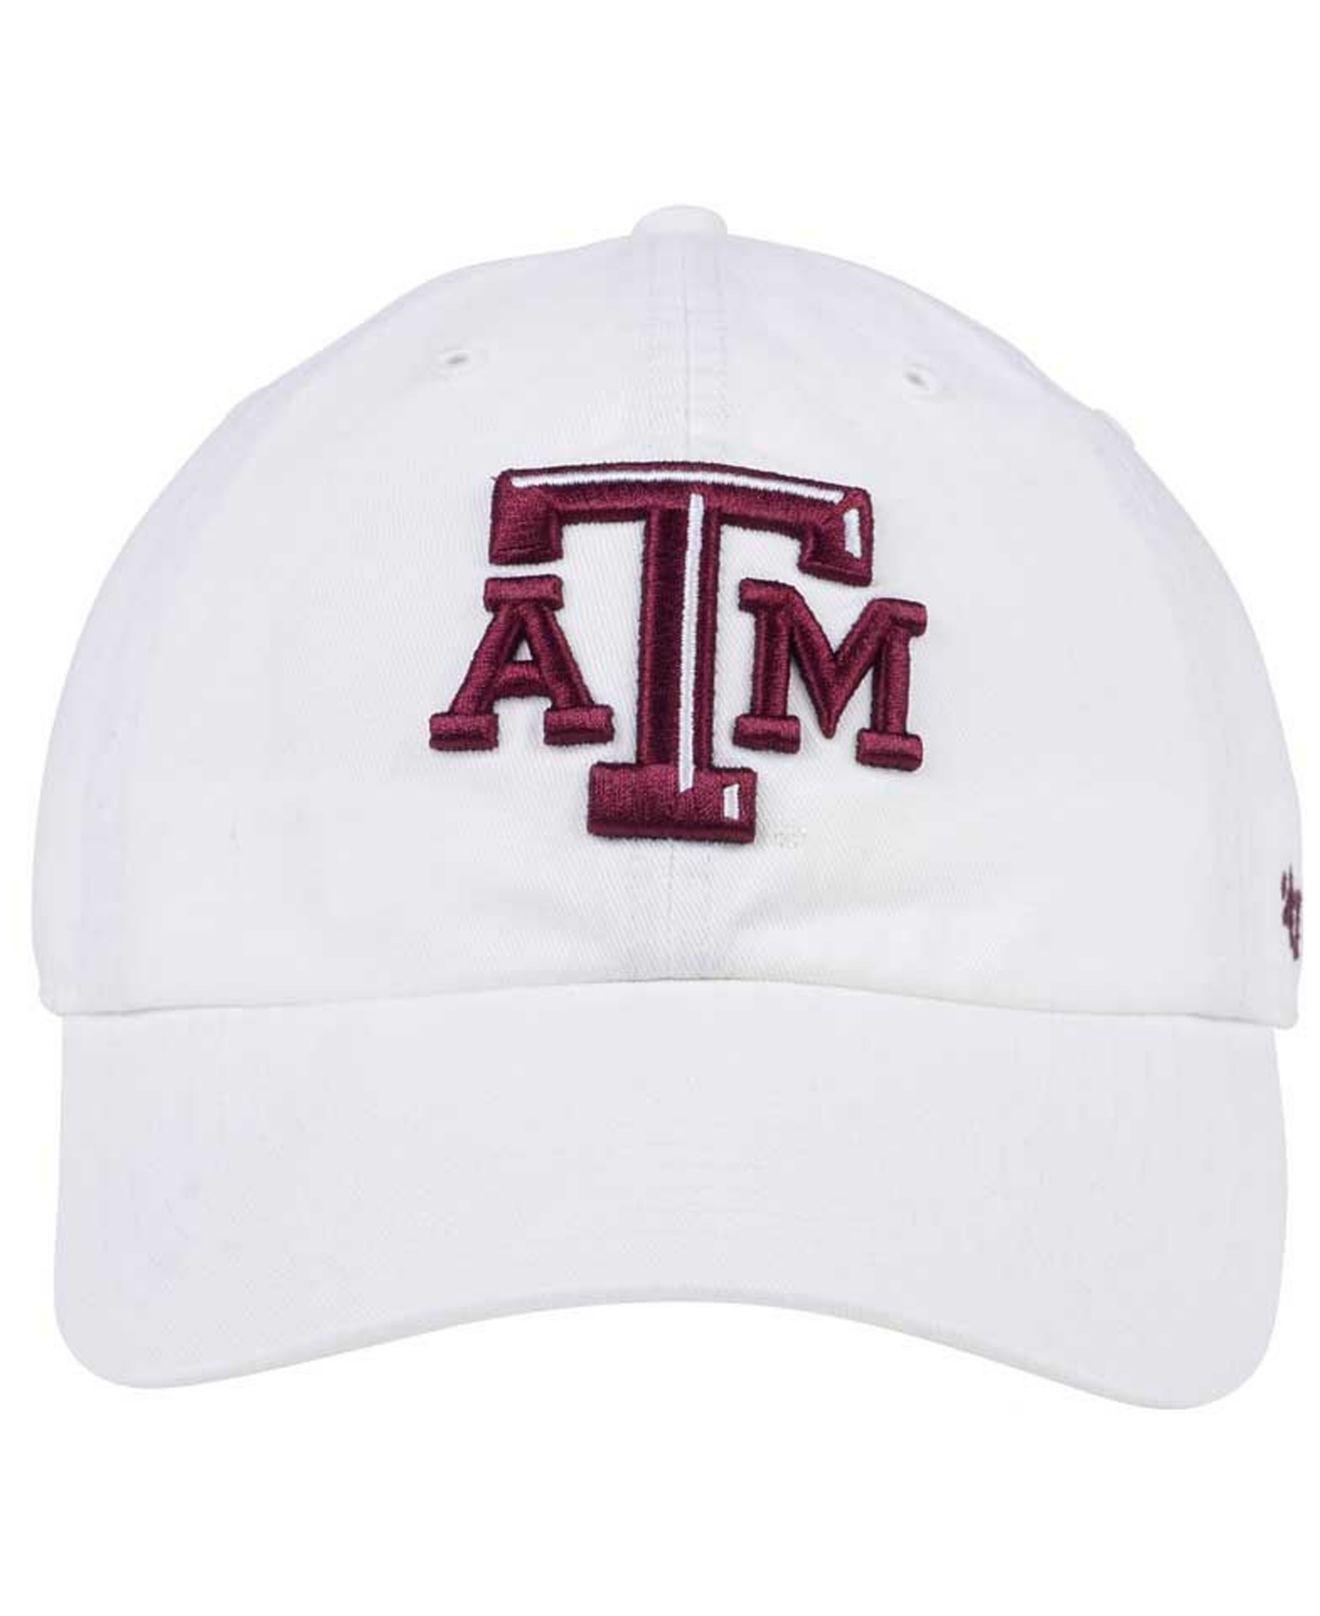 59d6d9940e1 Lyst - 47 Brand Texas A m Aggies Clean Up Cap in White for Men